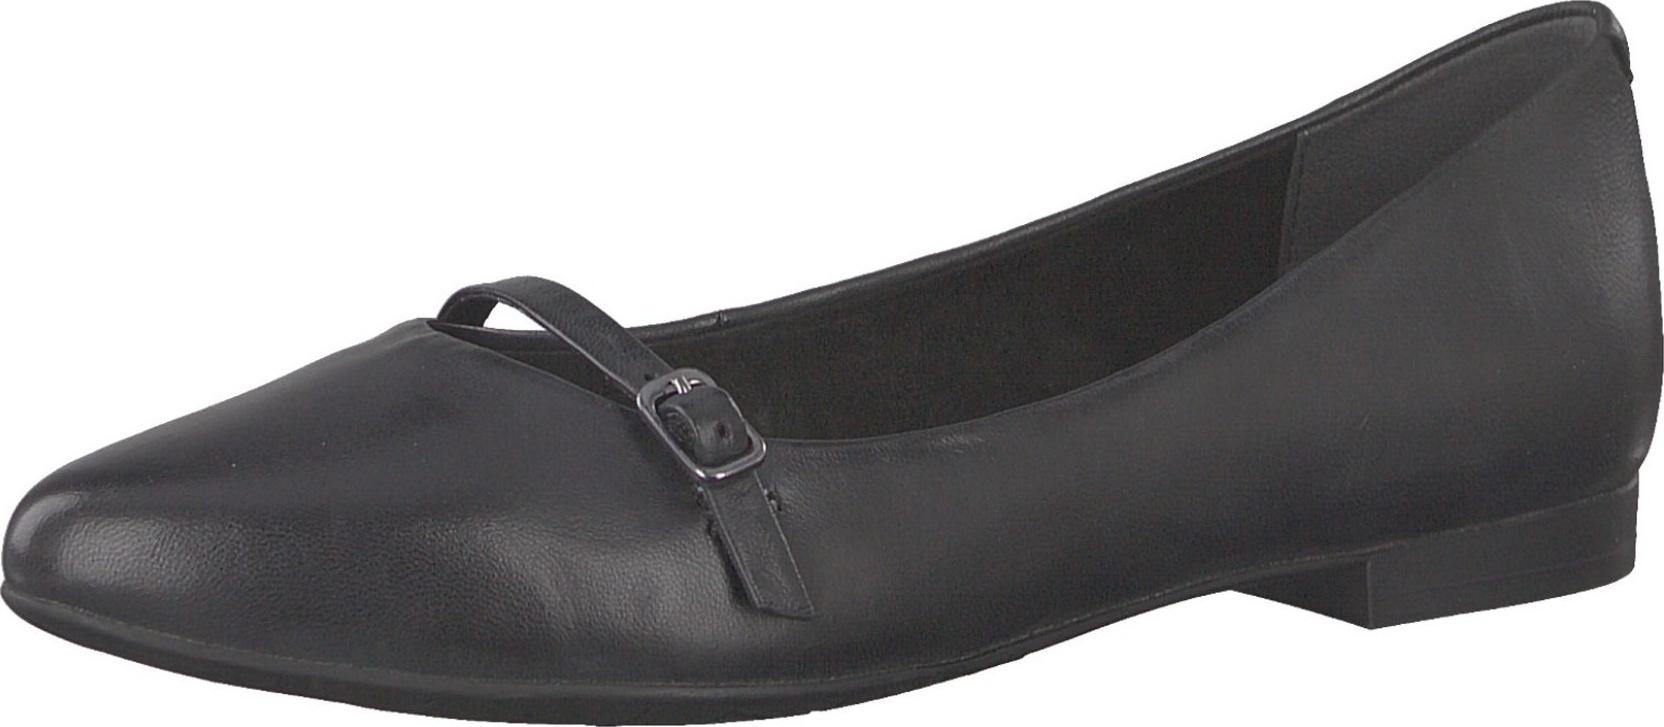 Dámská bota TAMARIS 1-1-24234-22 BLACK LEATHER 003 – E-shop Tamaris 9942b81a042